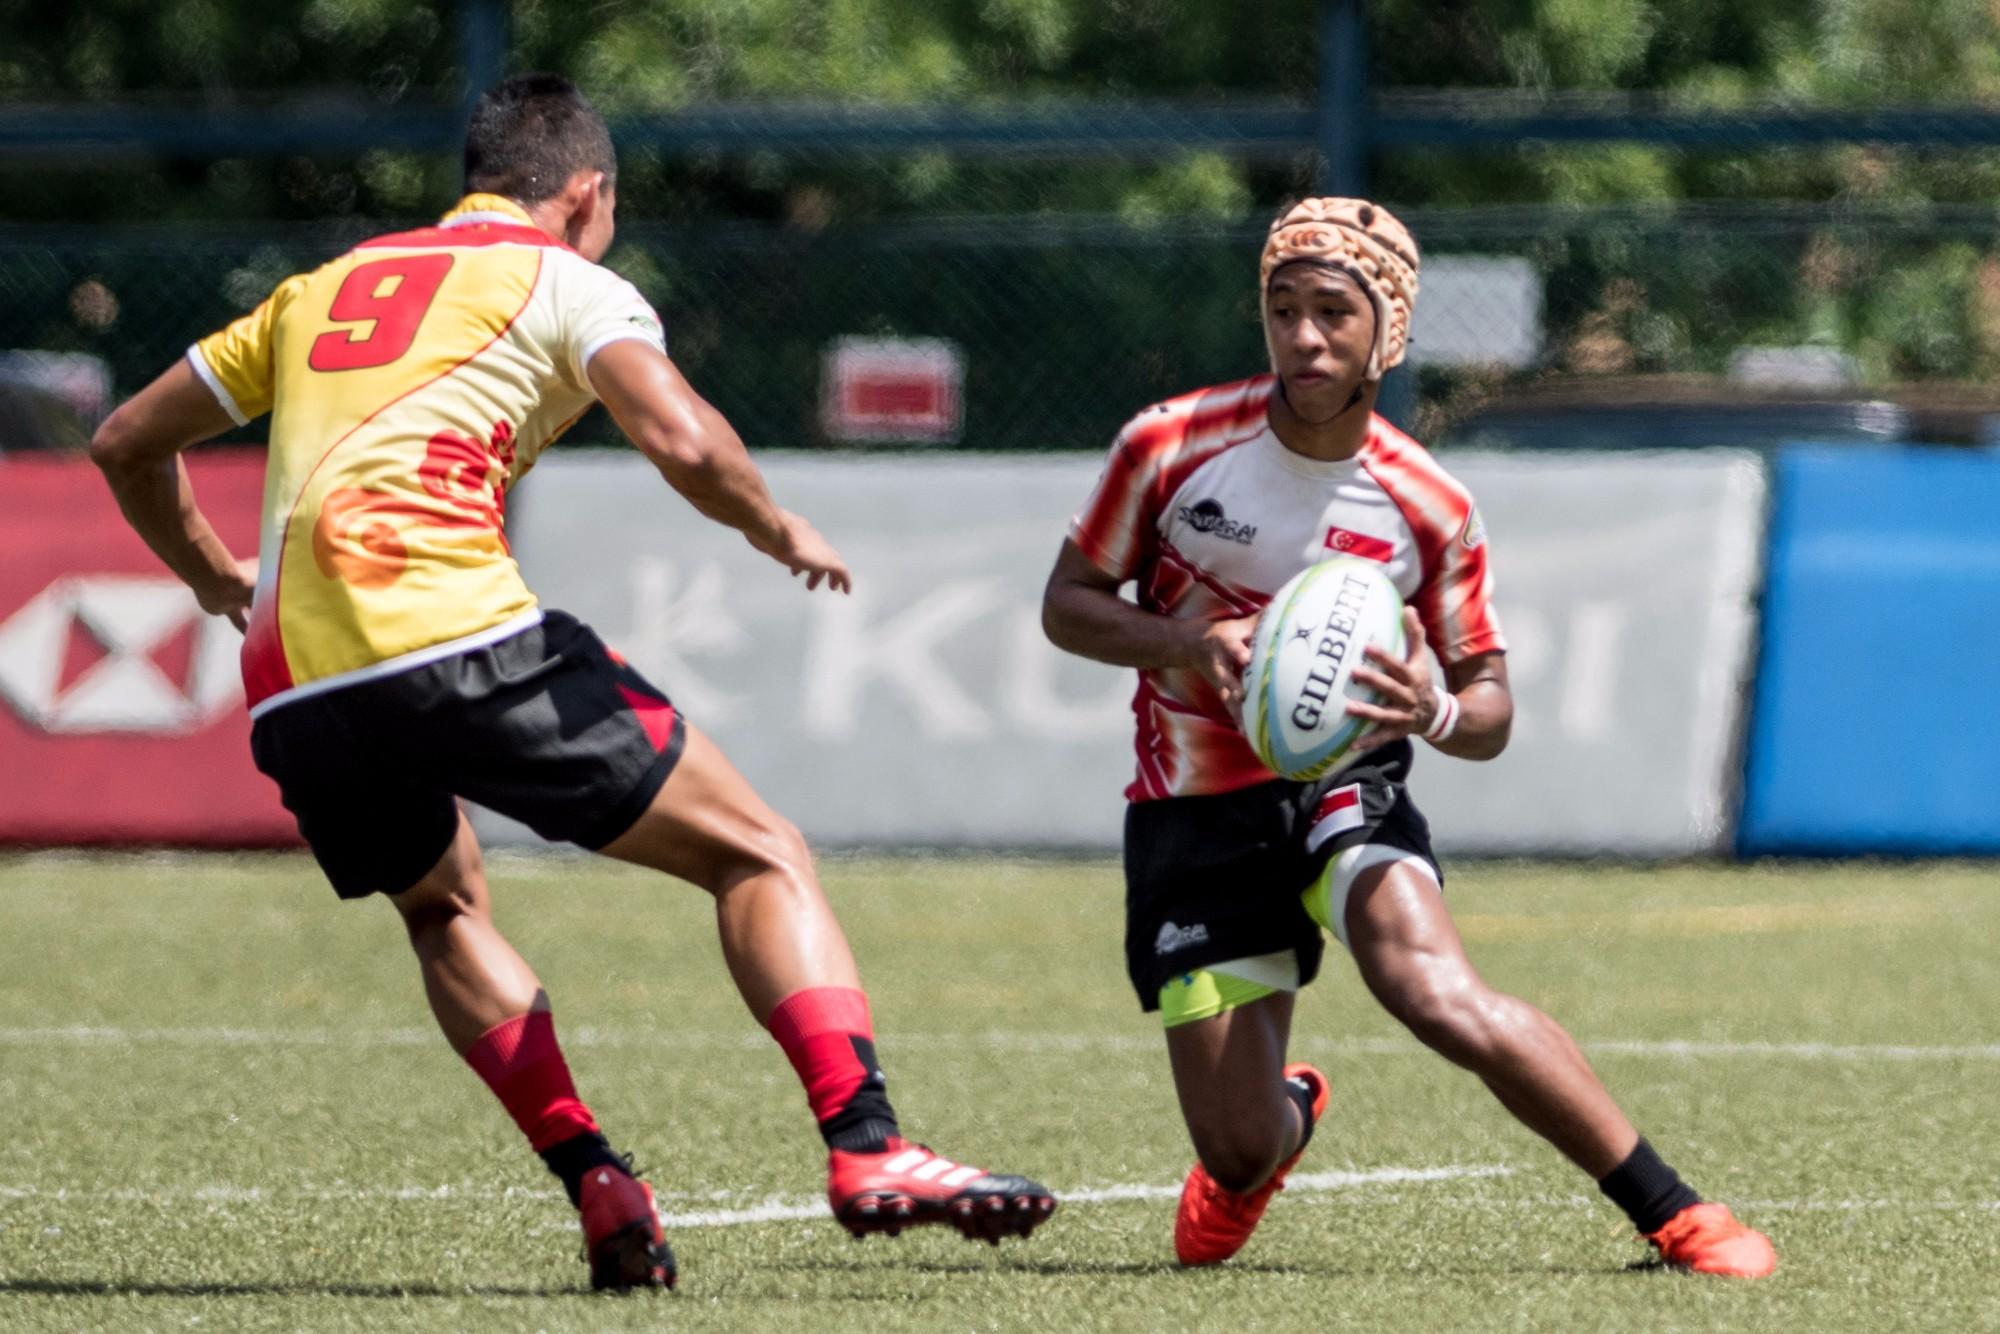 Asia Rugby U20 Sevens Series 2017 (Hong Kong)